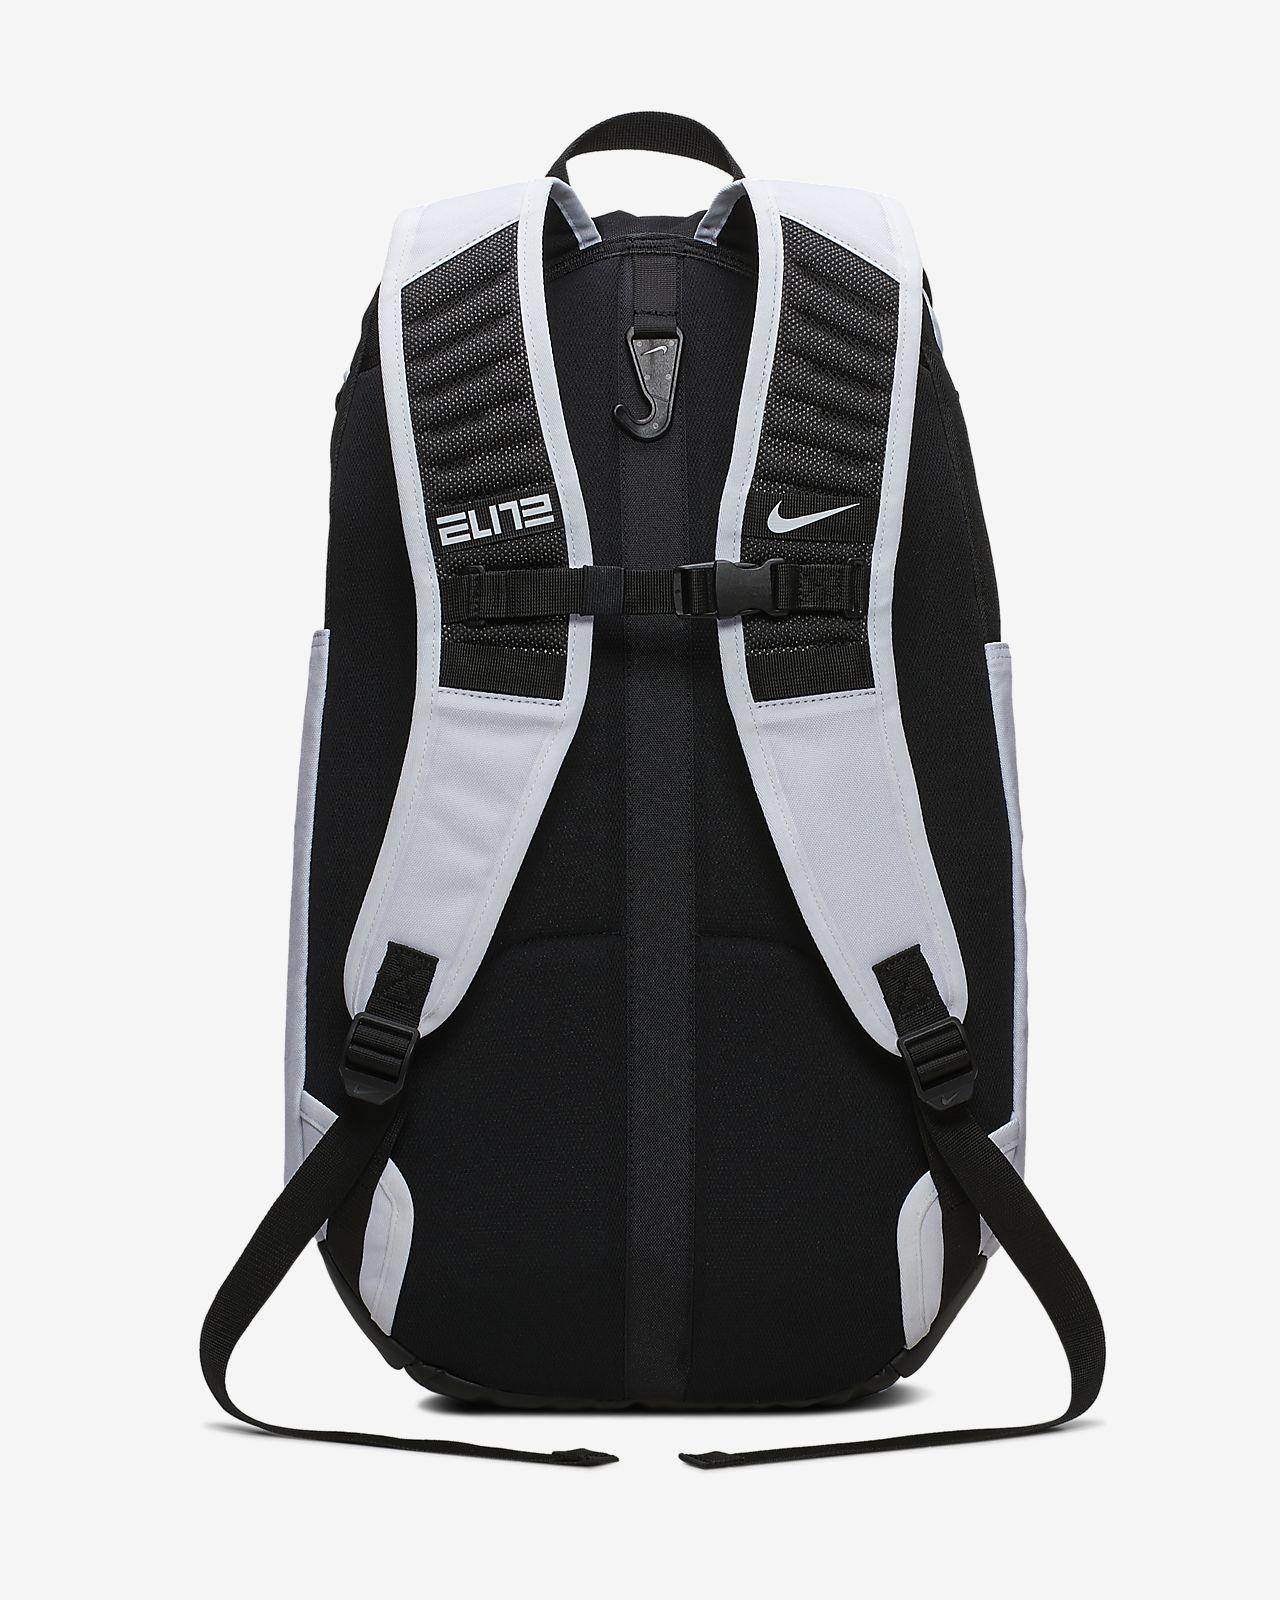 723924deb76 Nike Hoops Elite Pro Basketball Backpack. Nike.com